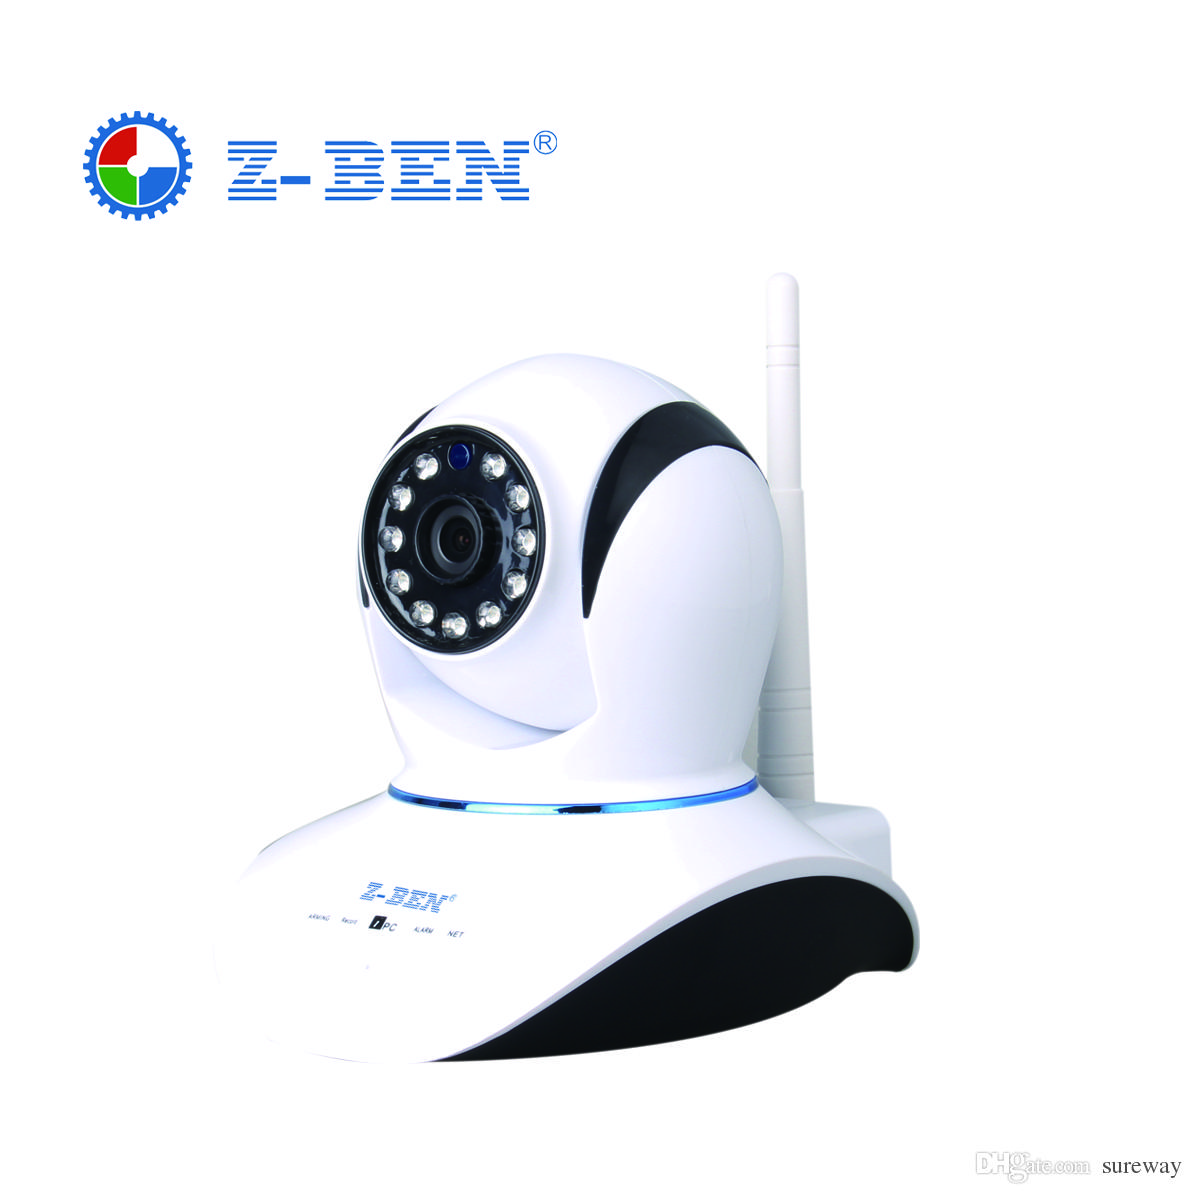 HD 720P كاميرا IP لاسلكية الأشعة تحت الحمراء للرؤية الليلية تسجيل الصوت شبكة الدوائر التلفزيونية المغلقة Onvif كاميرا IP داخلي